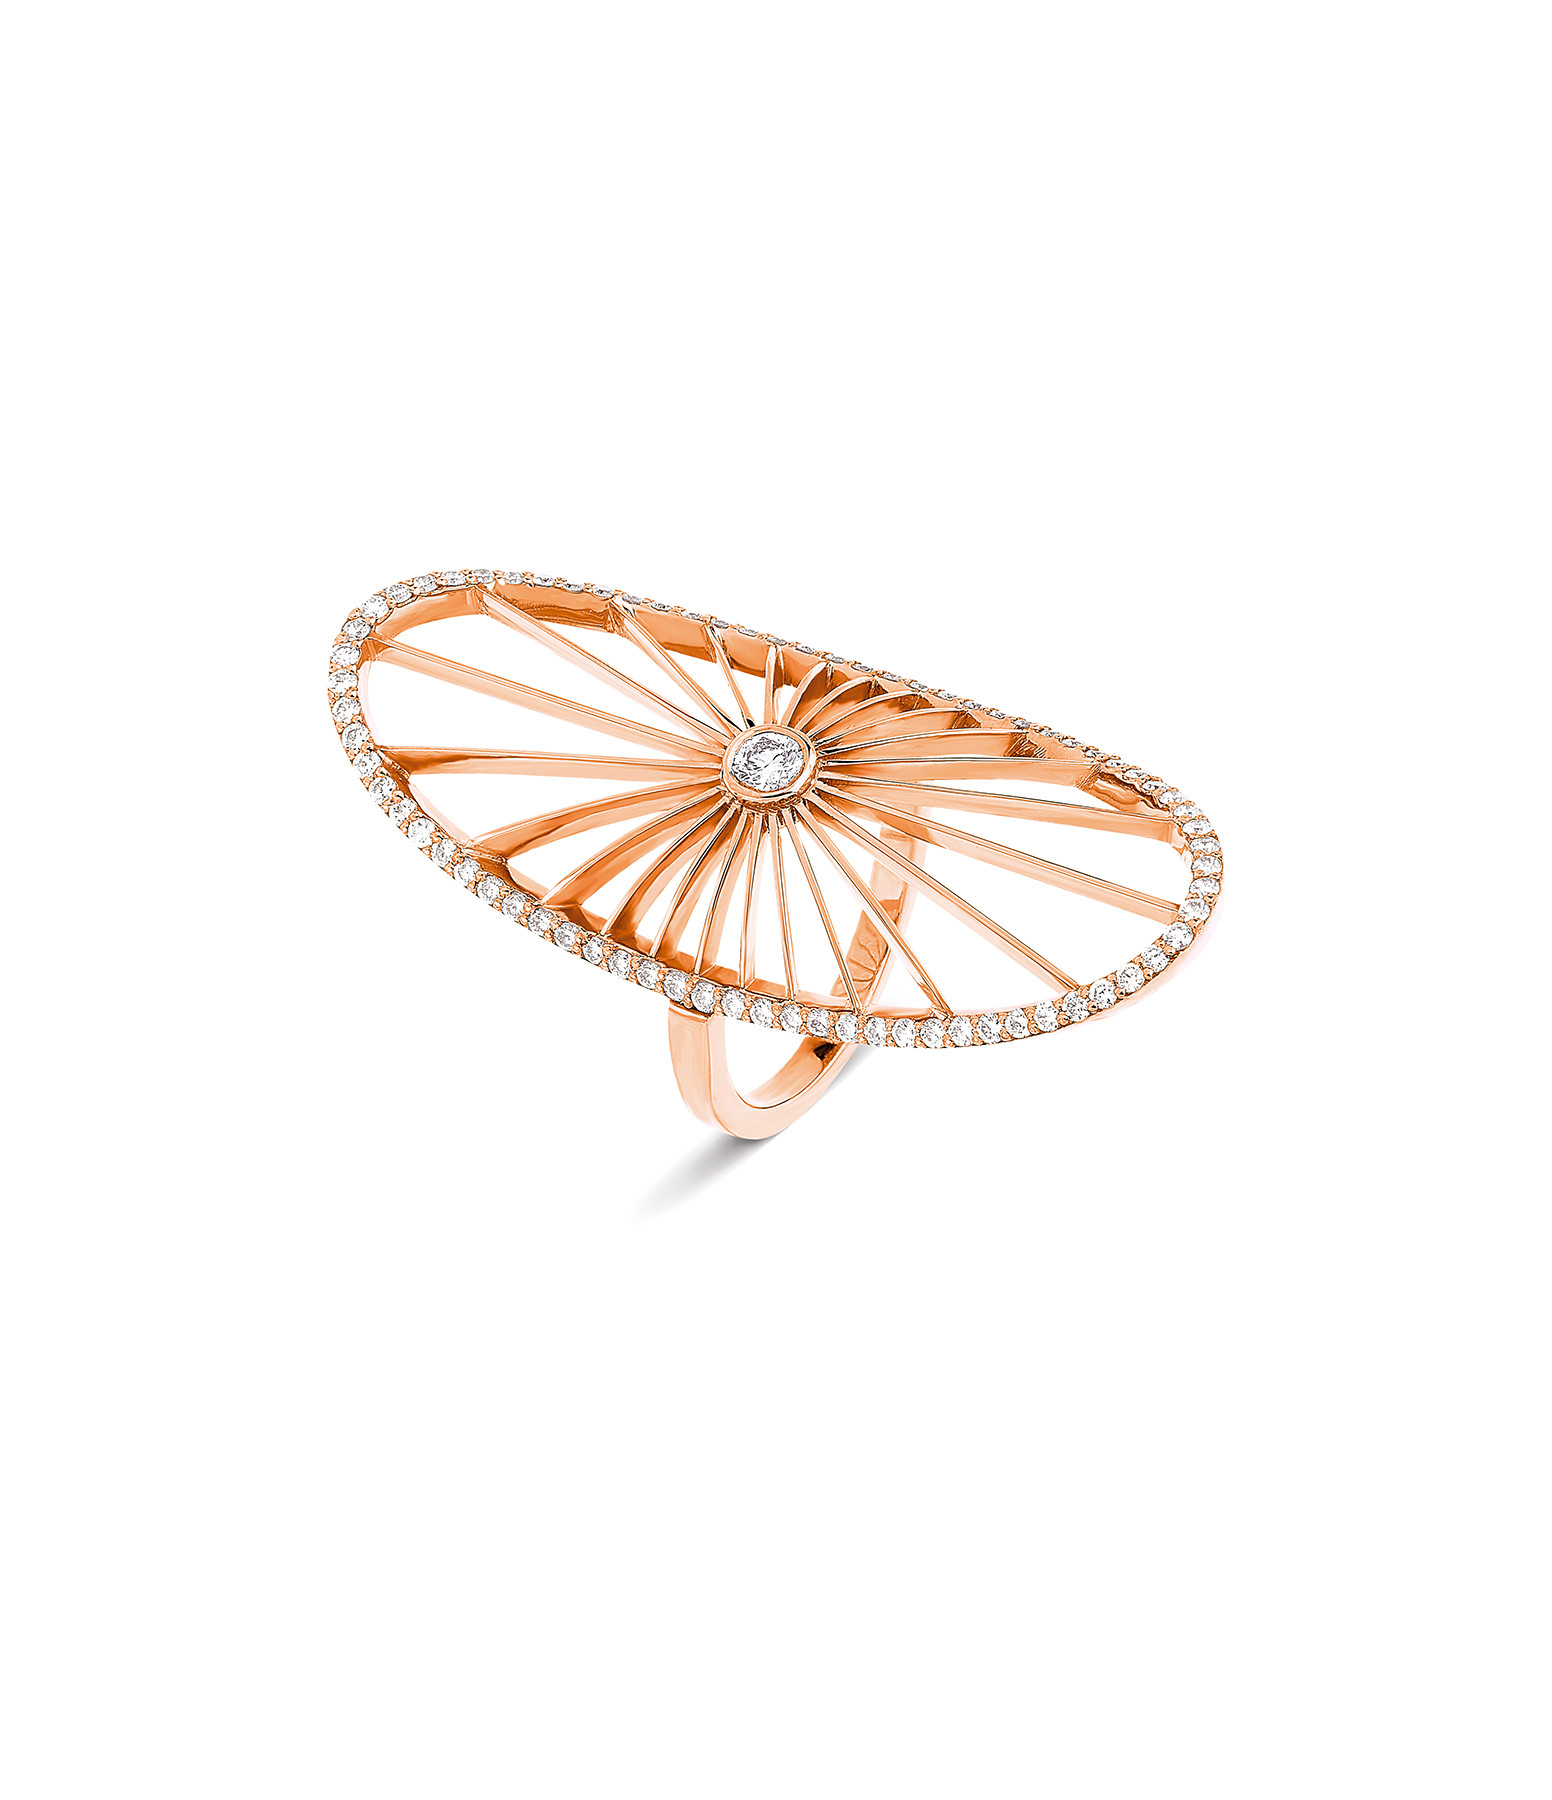 NAVA JOAILLERIE - Bague Cheyenne Ovale Diamants Or Rose